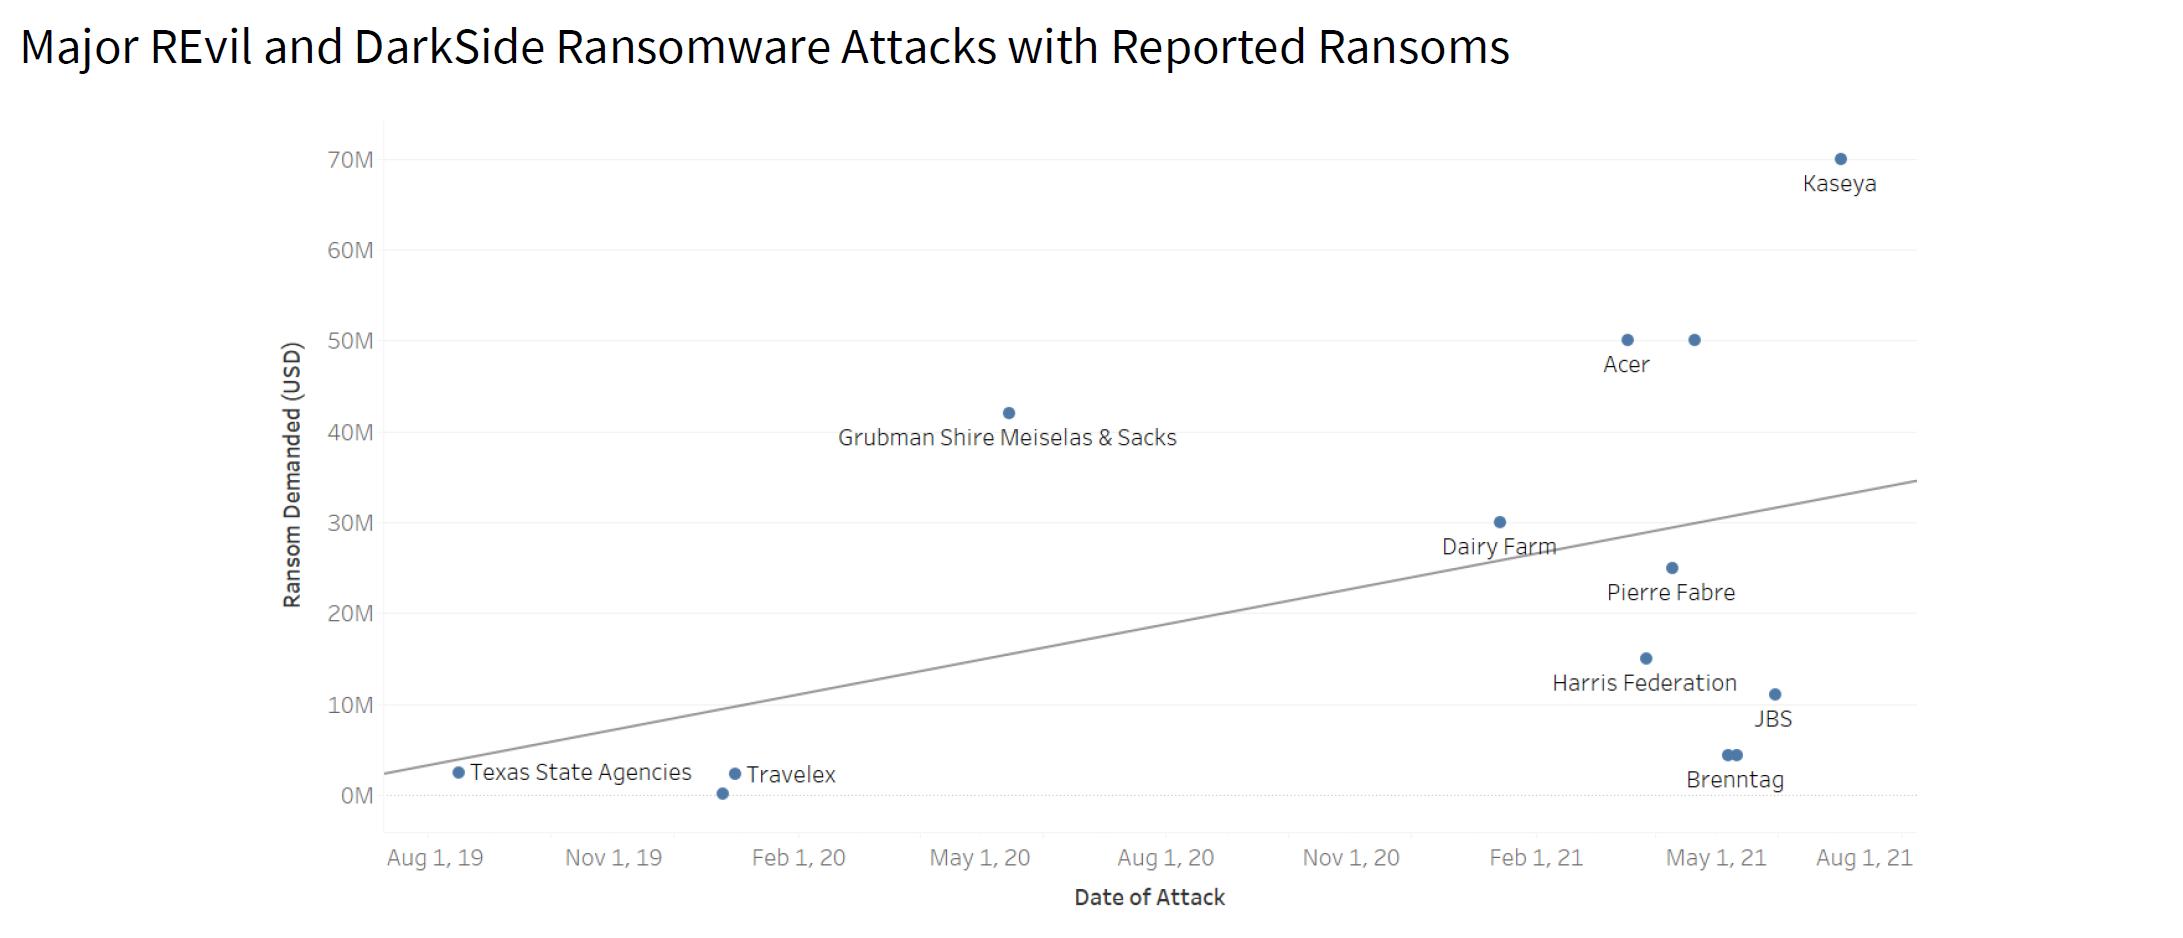 Major Revil and DarkSide Ransomware Attacks